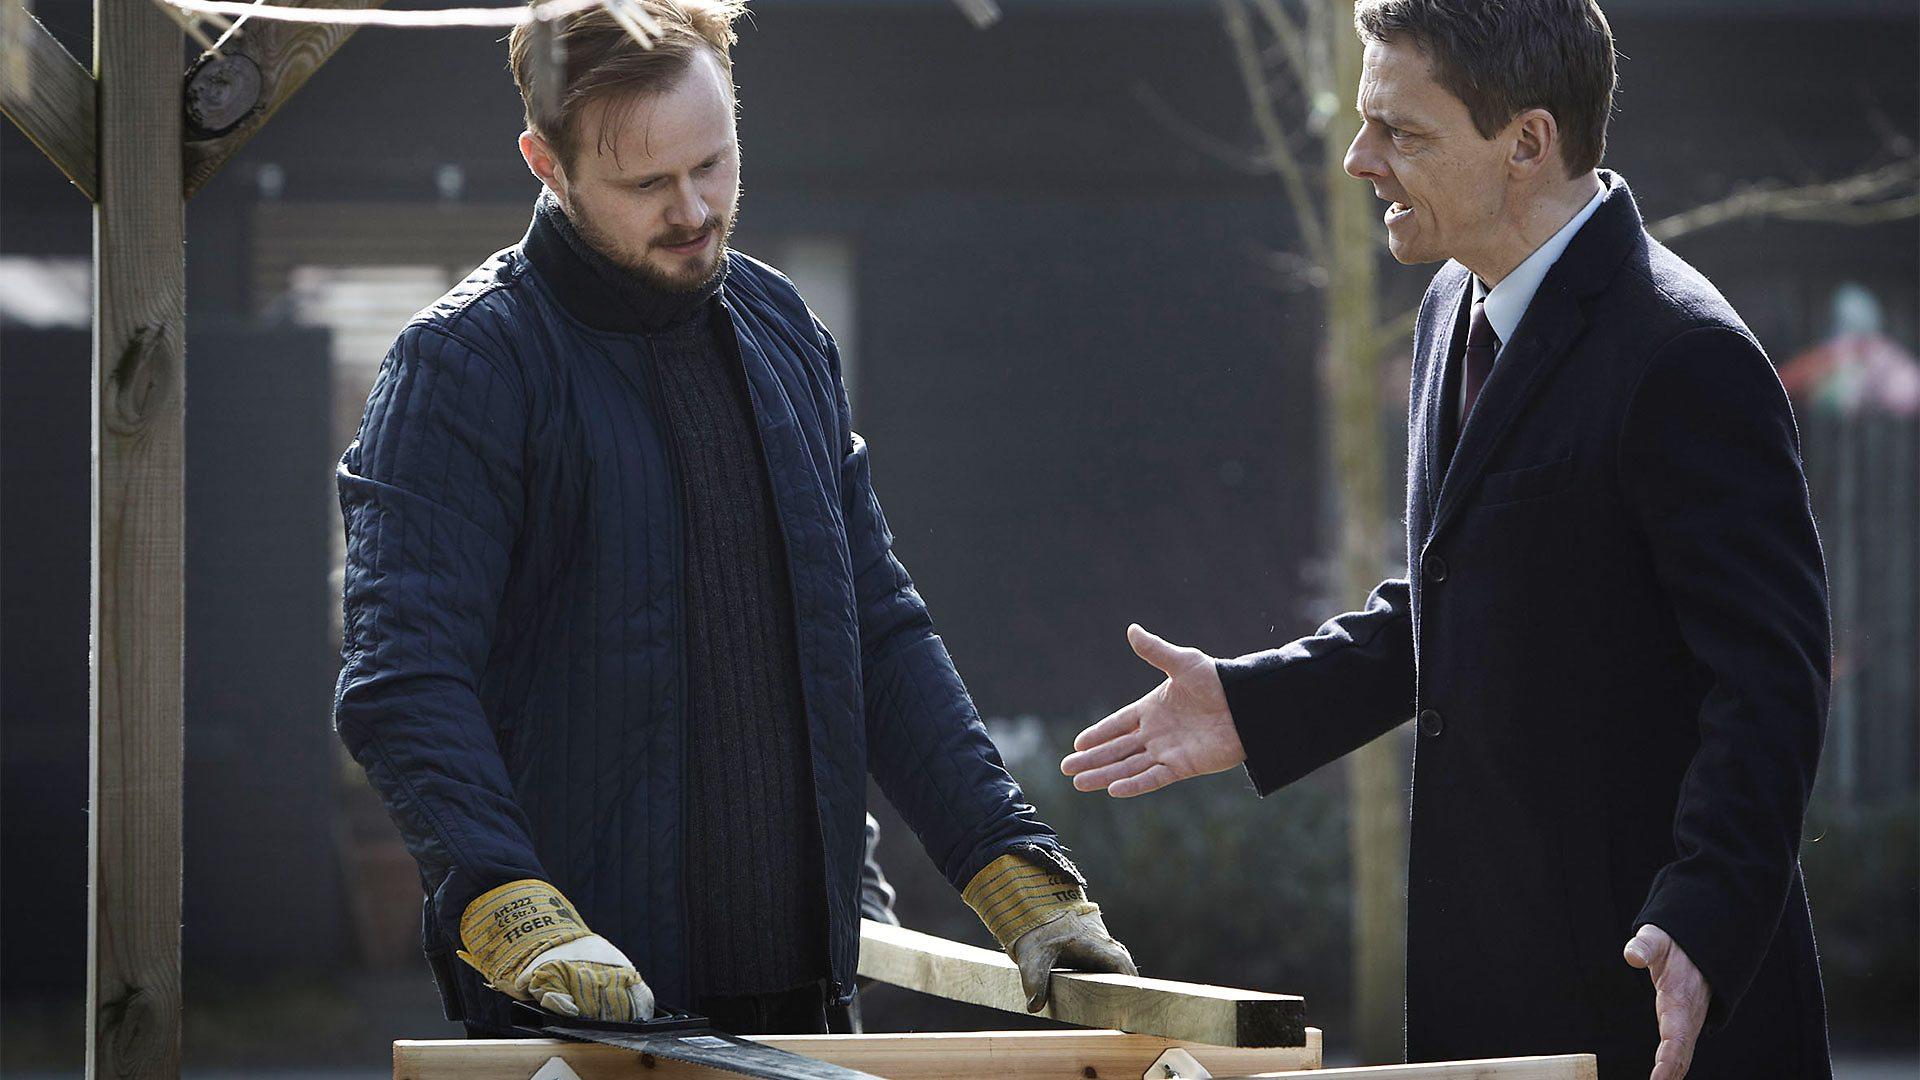 BBC iPlayer - The Killing - Series 3: Episode 6